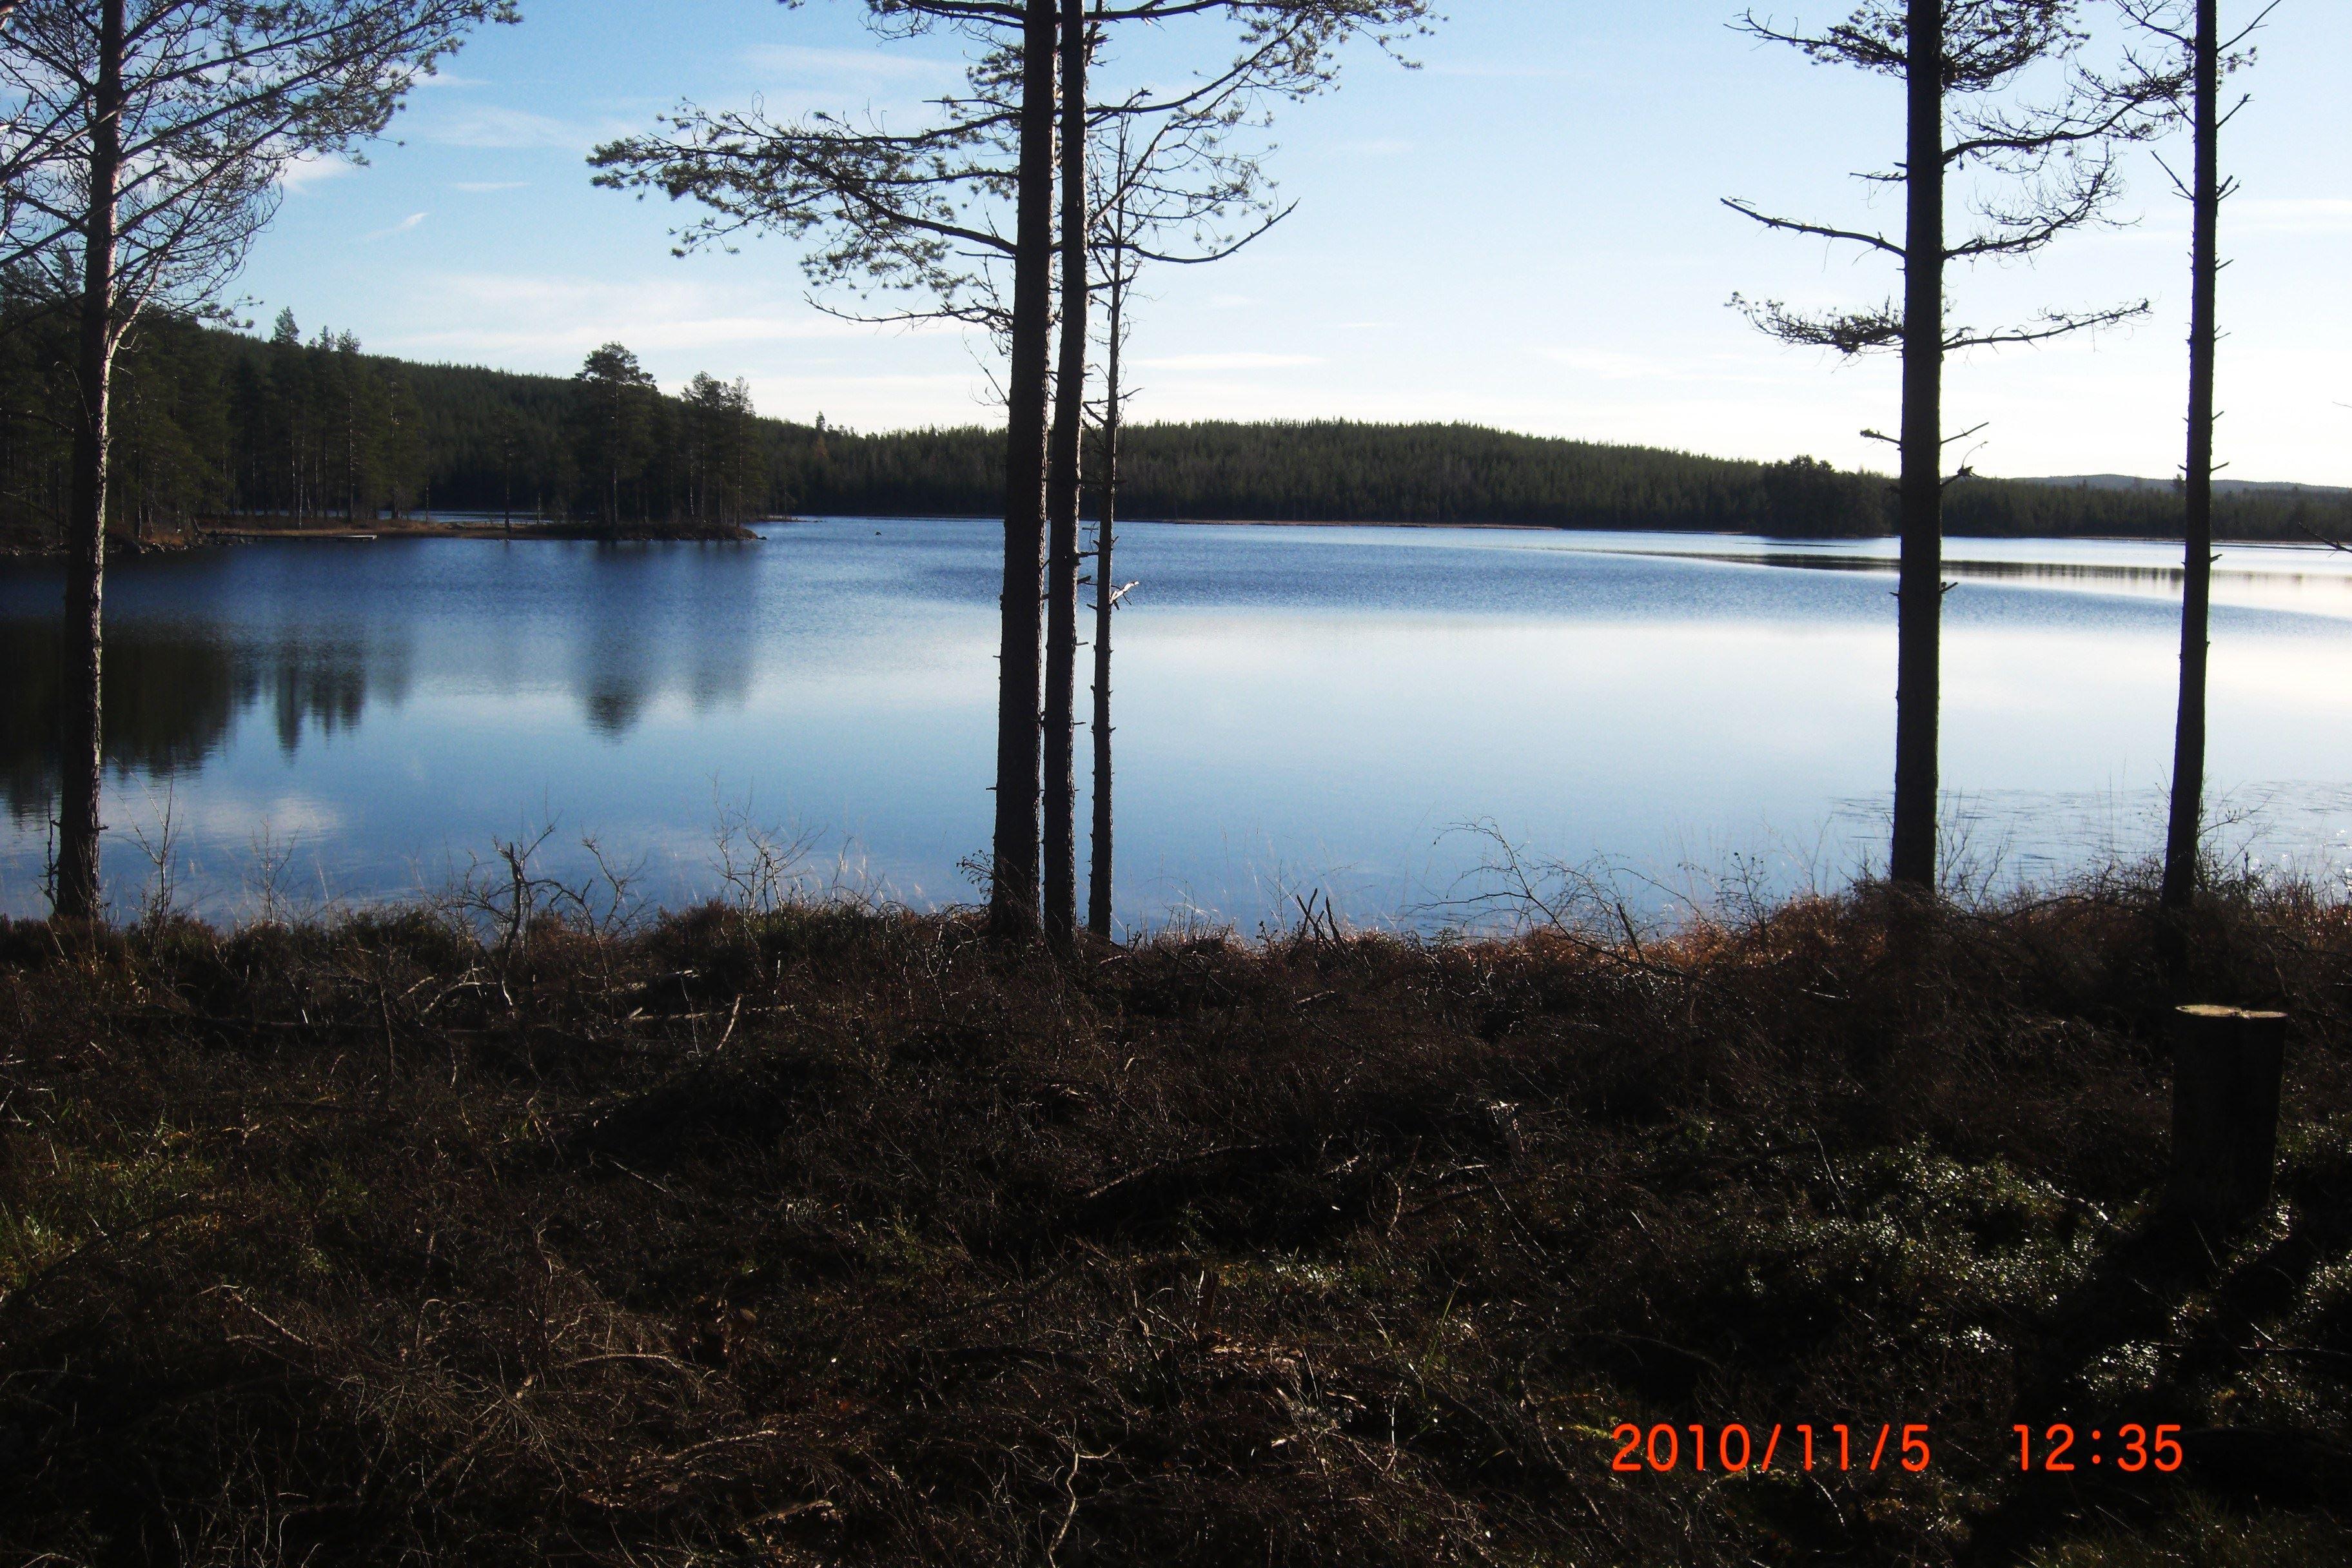 Sjönära stuga vid sjön Flaten, 10-12 bäddar, 19 m2